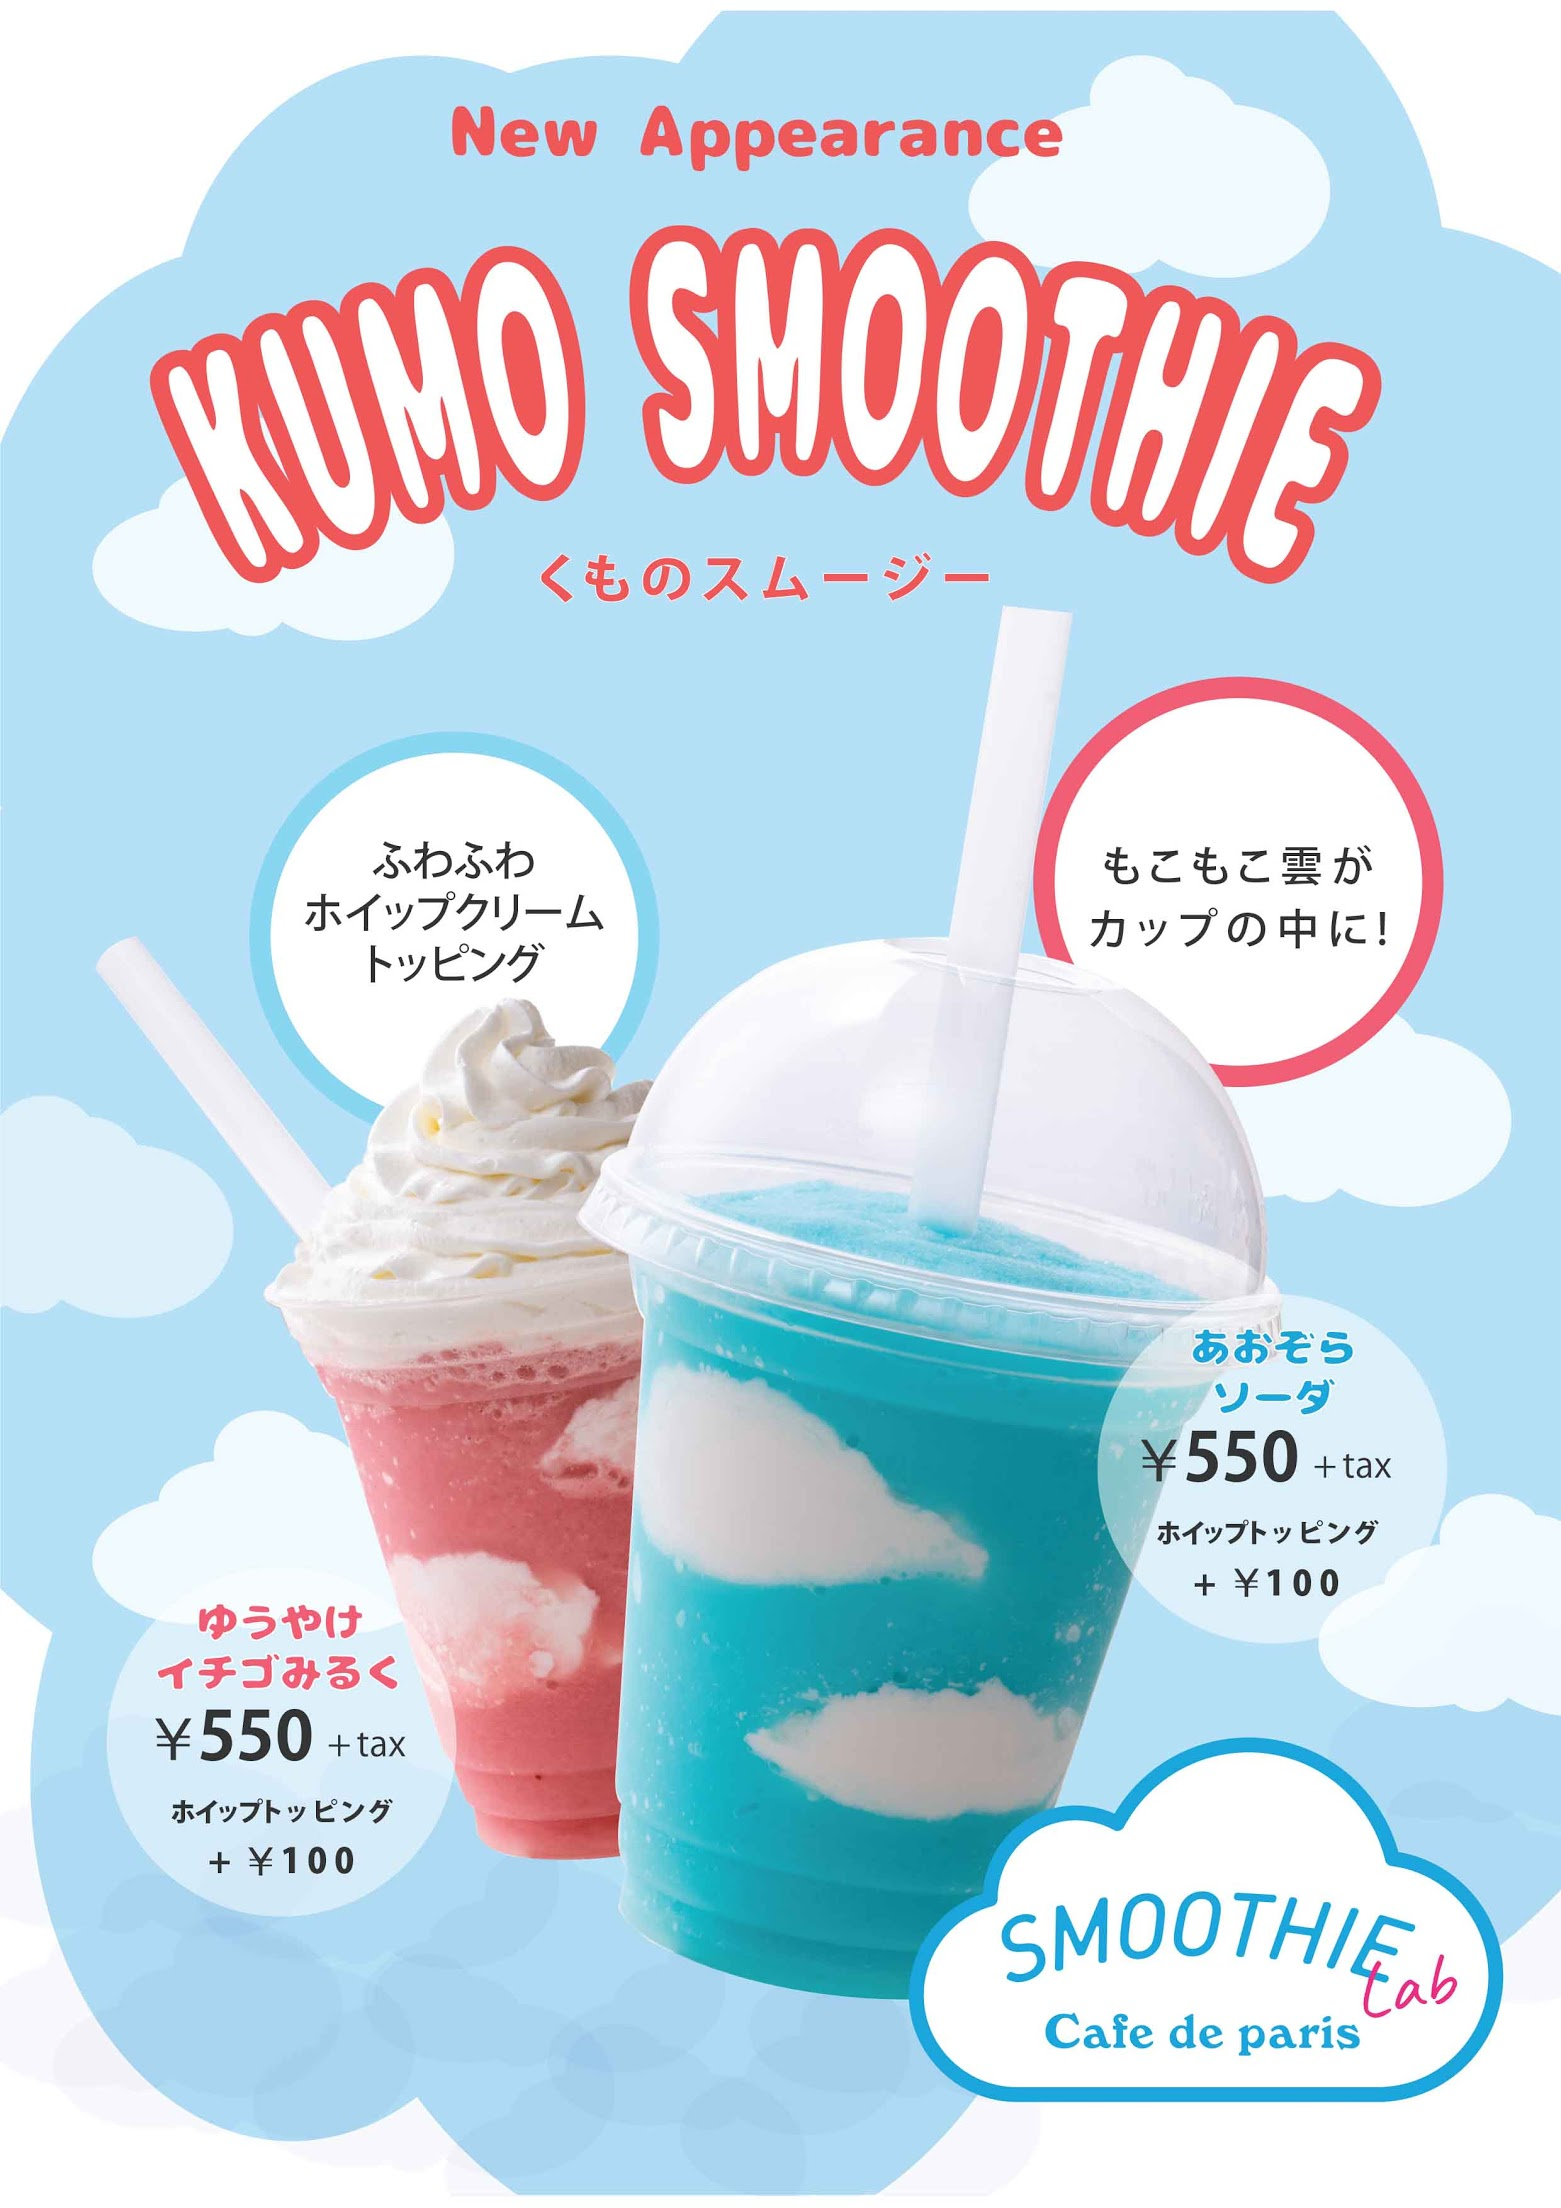 Kumo Smoothie 雲のスムージー